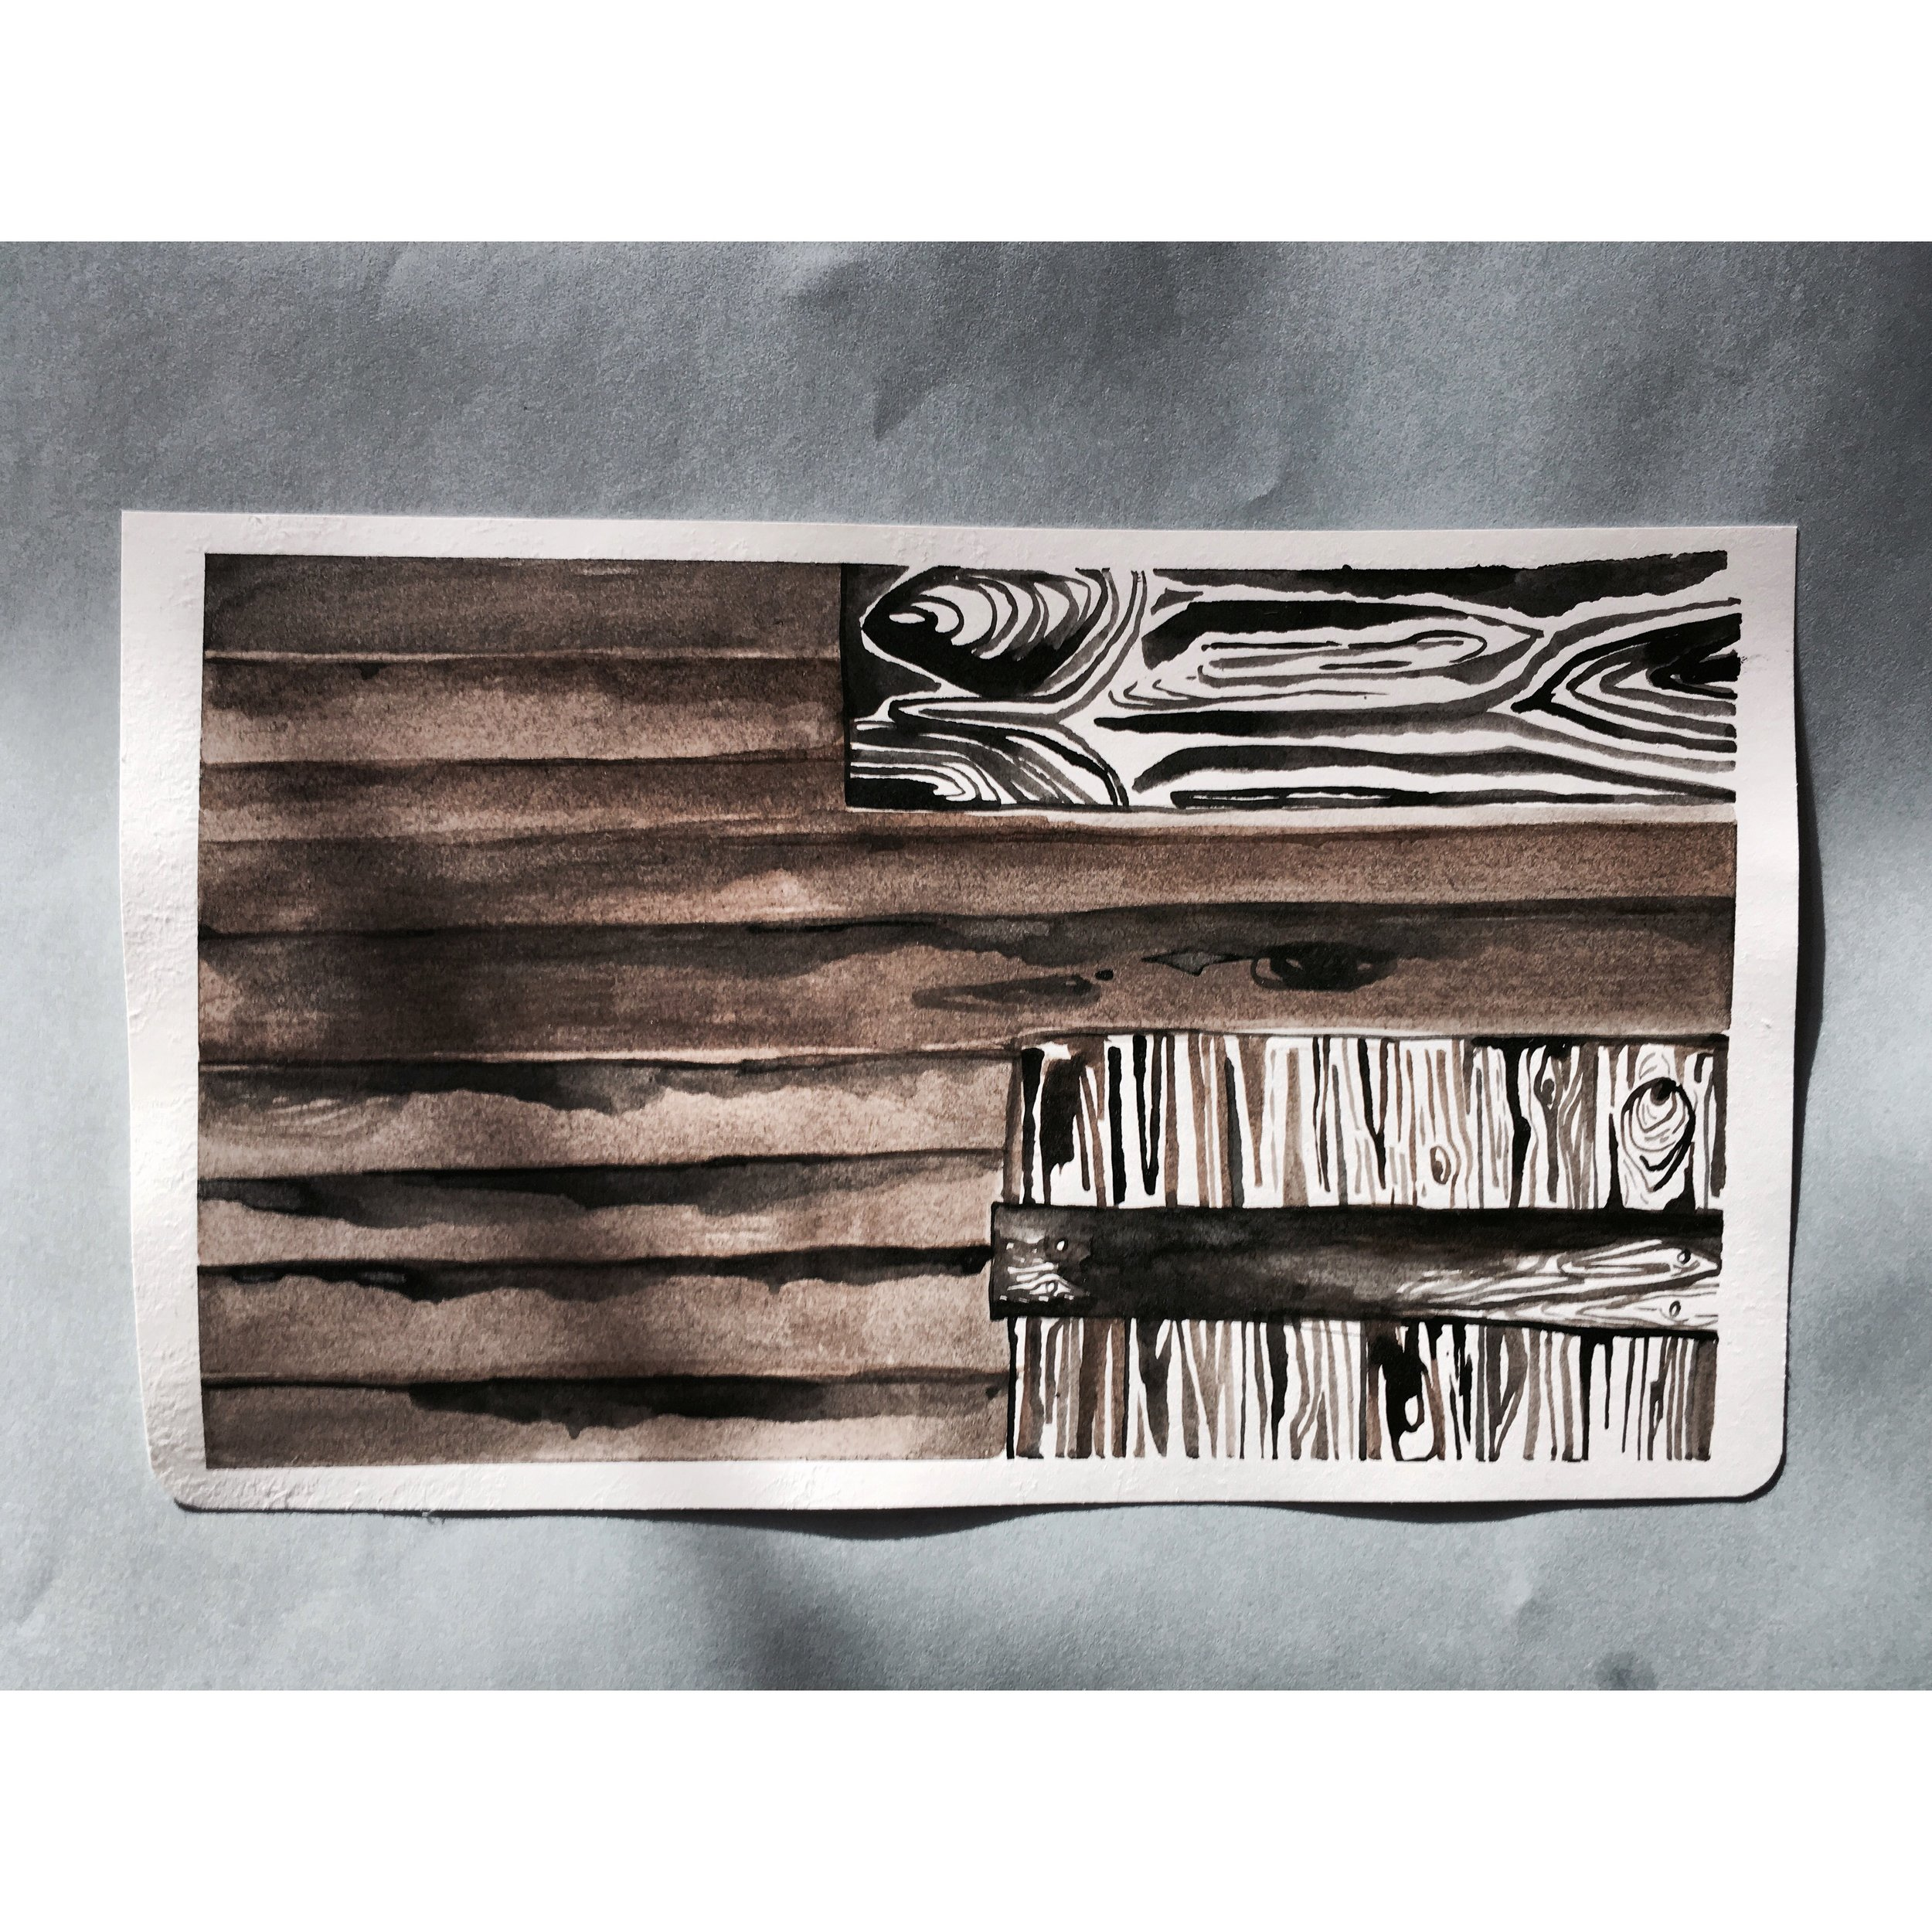 Pen + Ink Illustration, Brooklin Maine, 2017